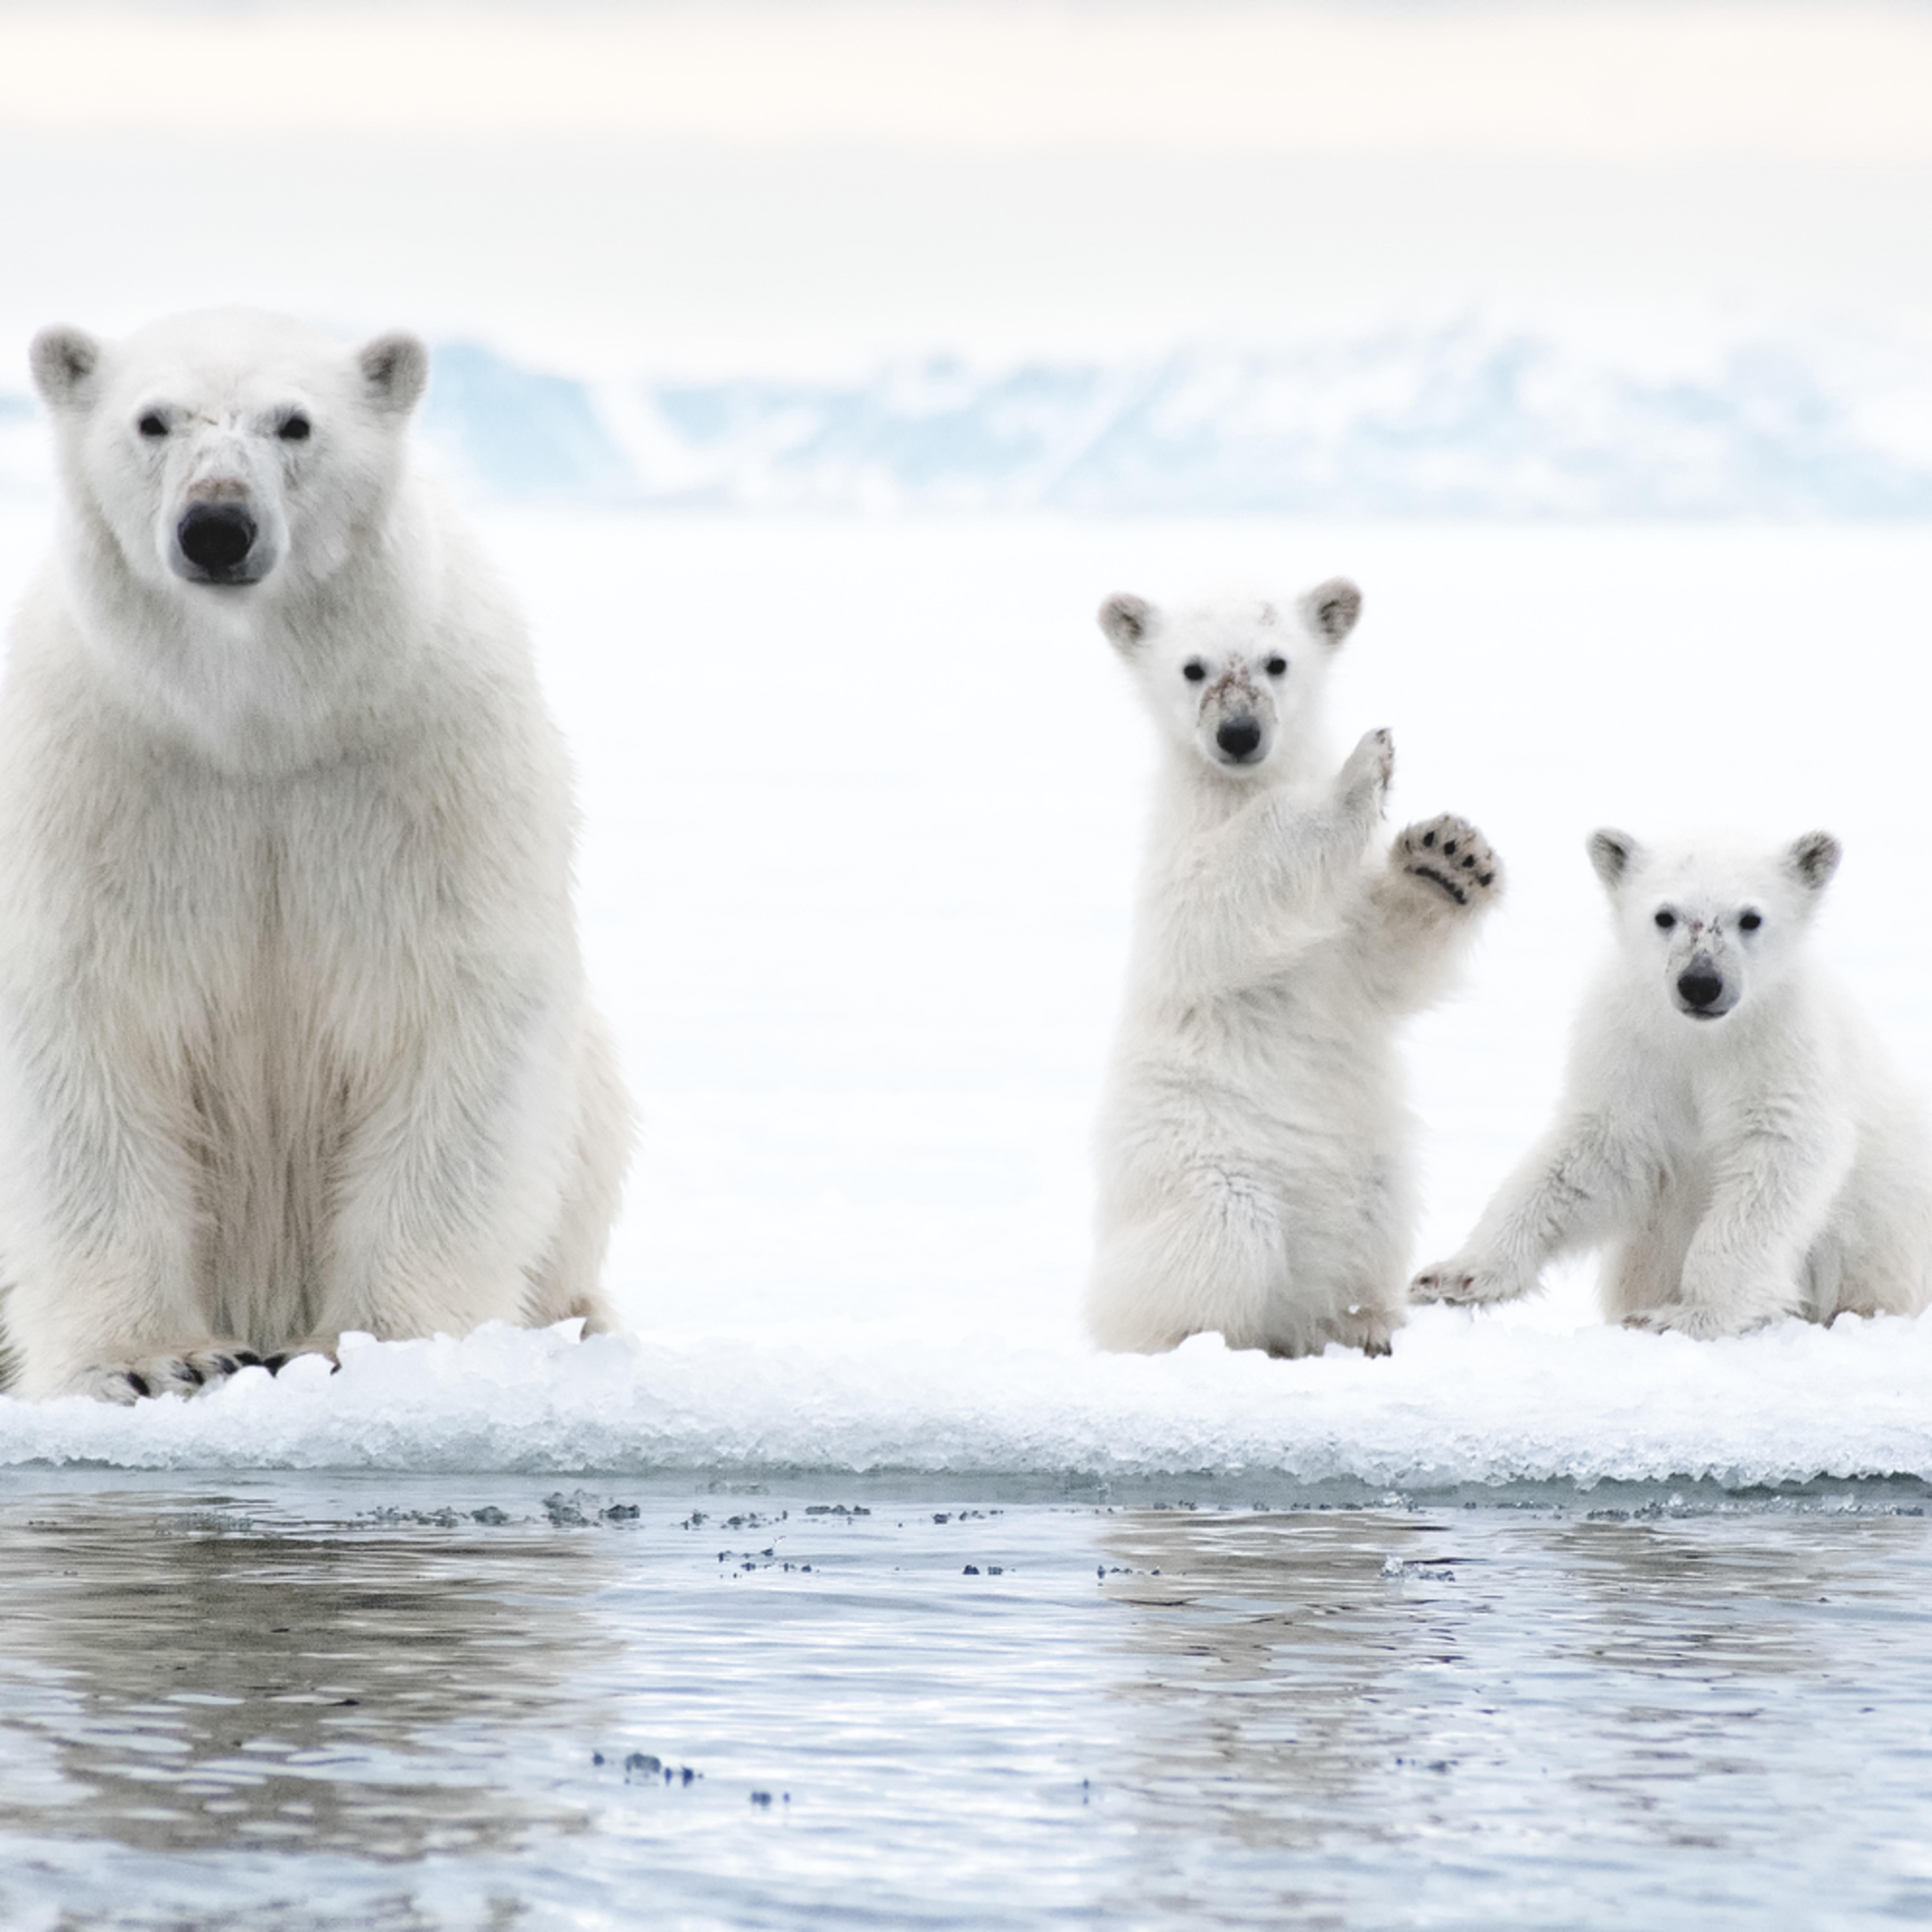 Ice bears 100 hf6ovp